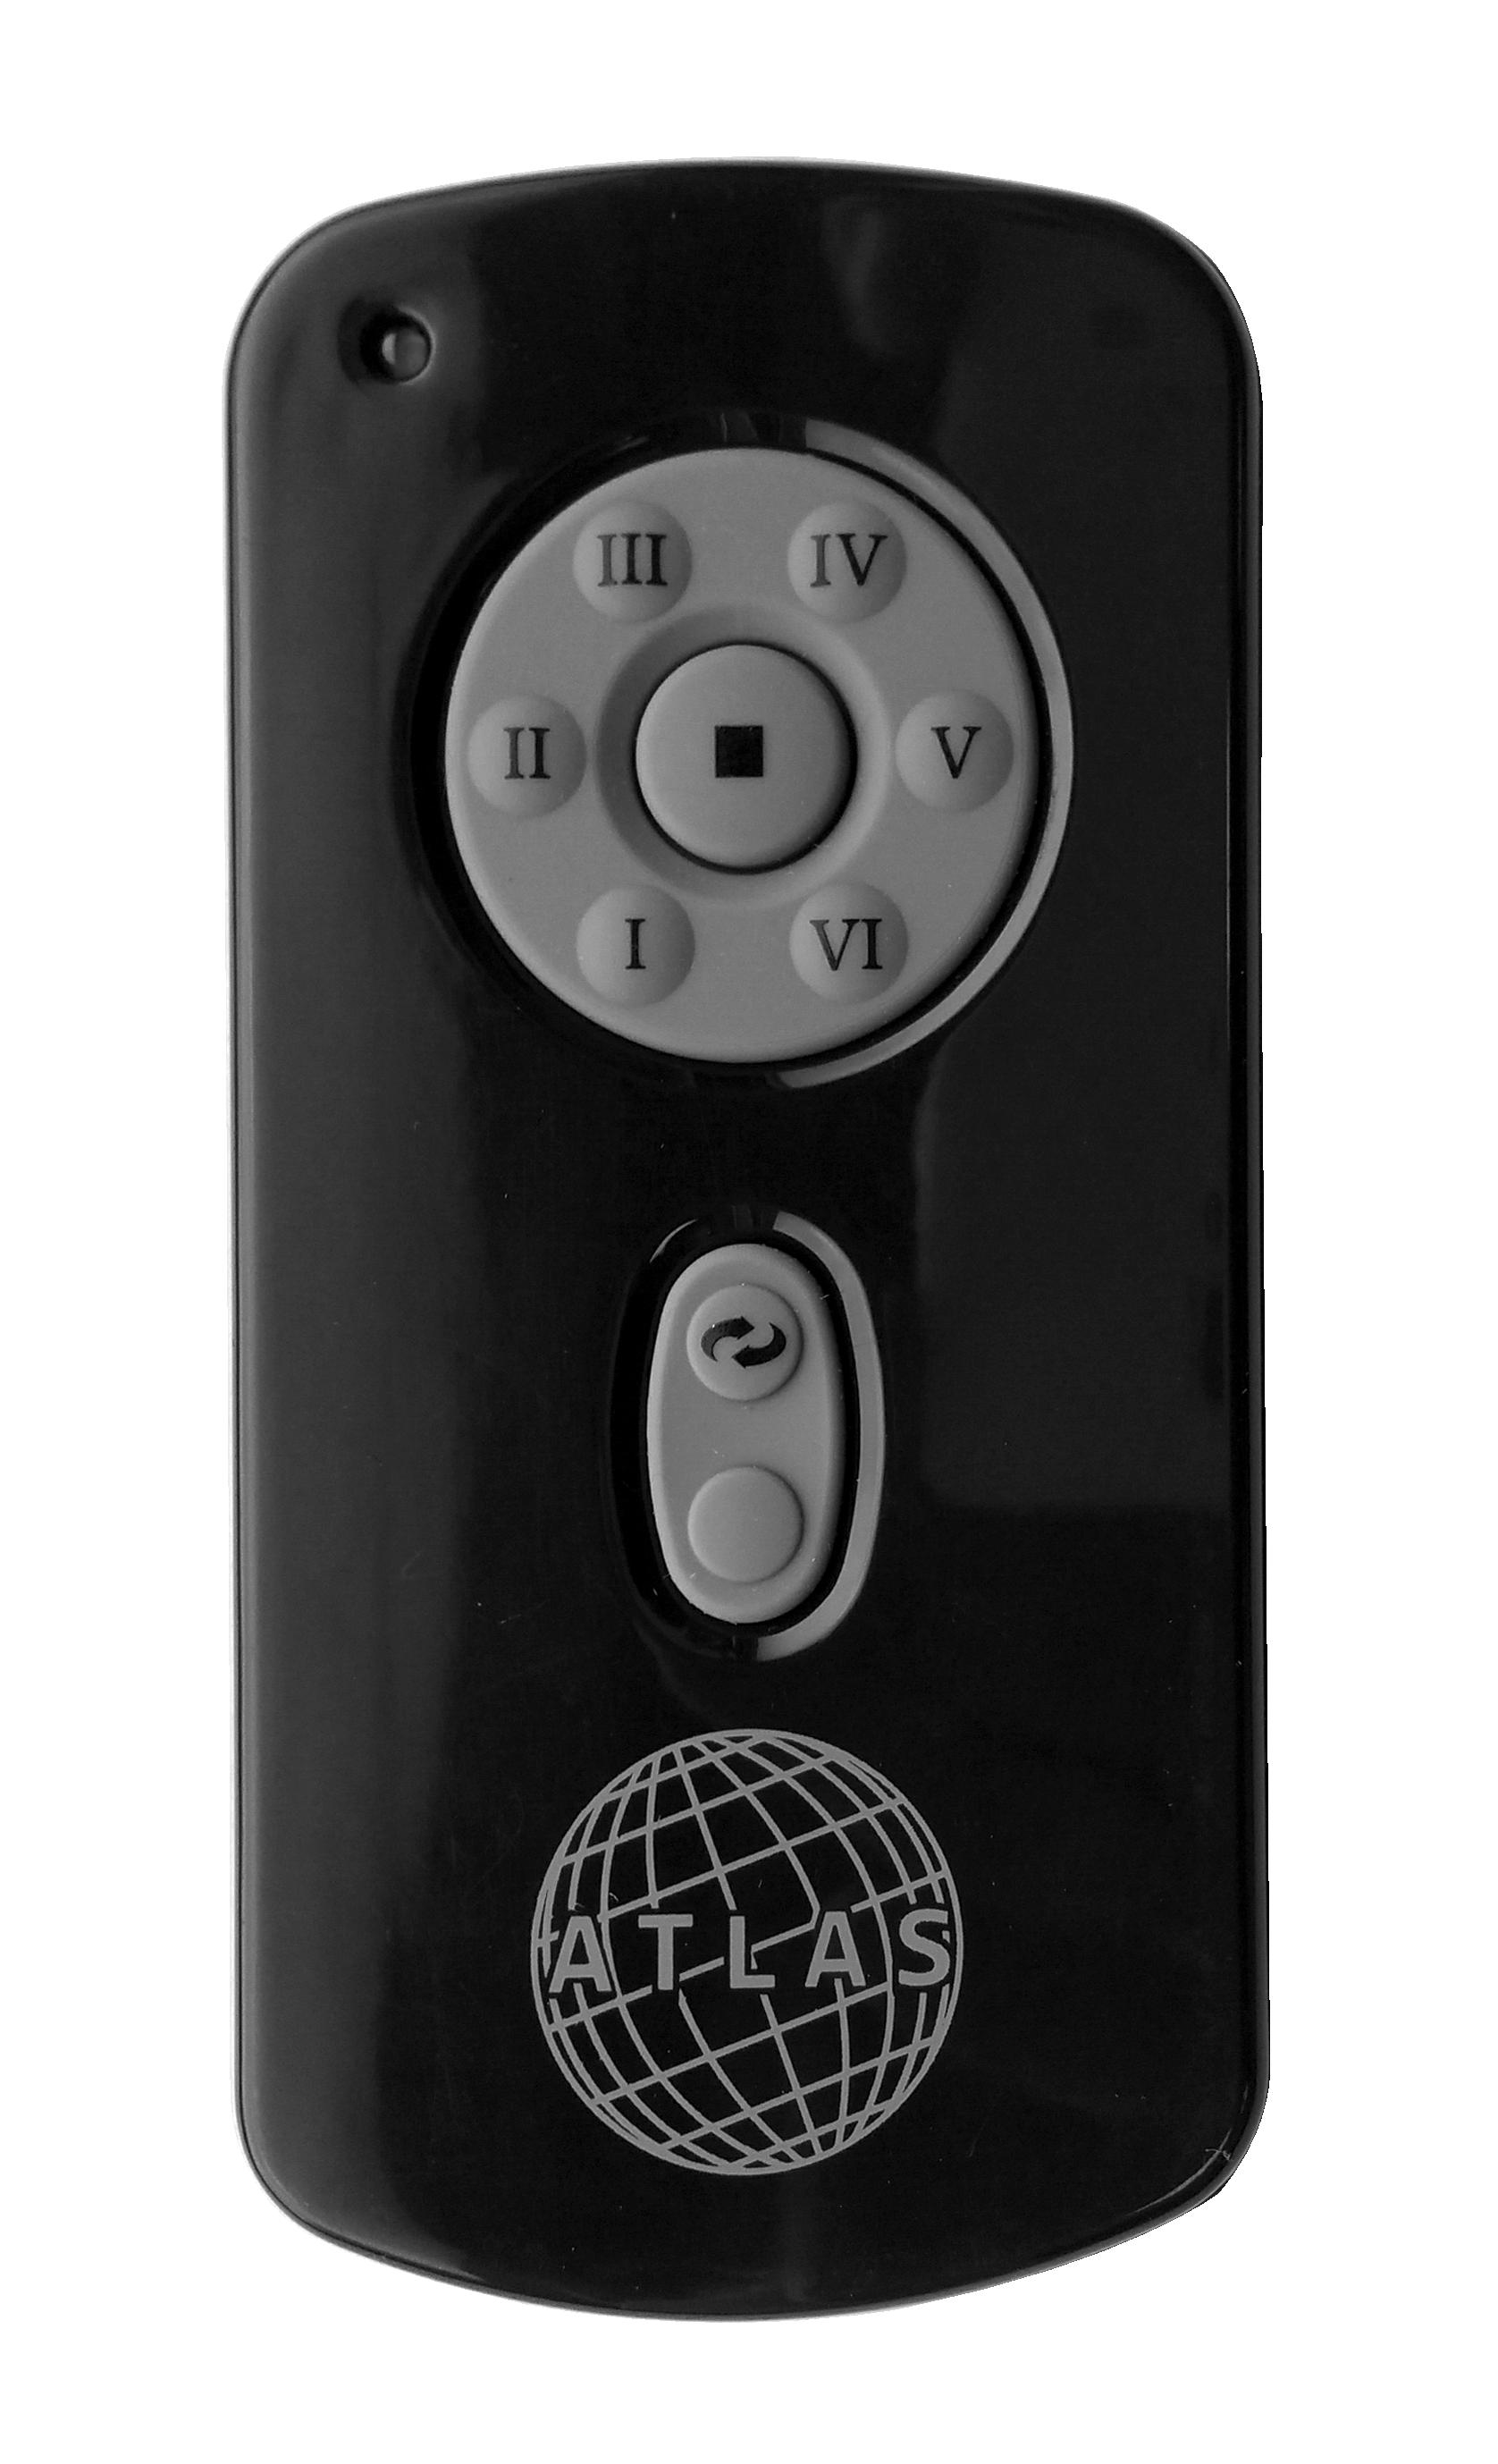 Atlas Remote Control Ceiling Fan Controls In Black